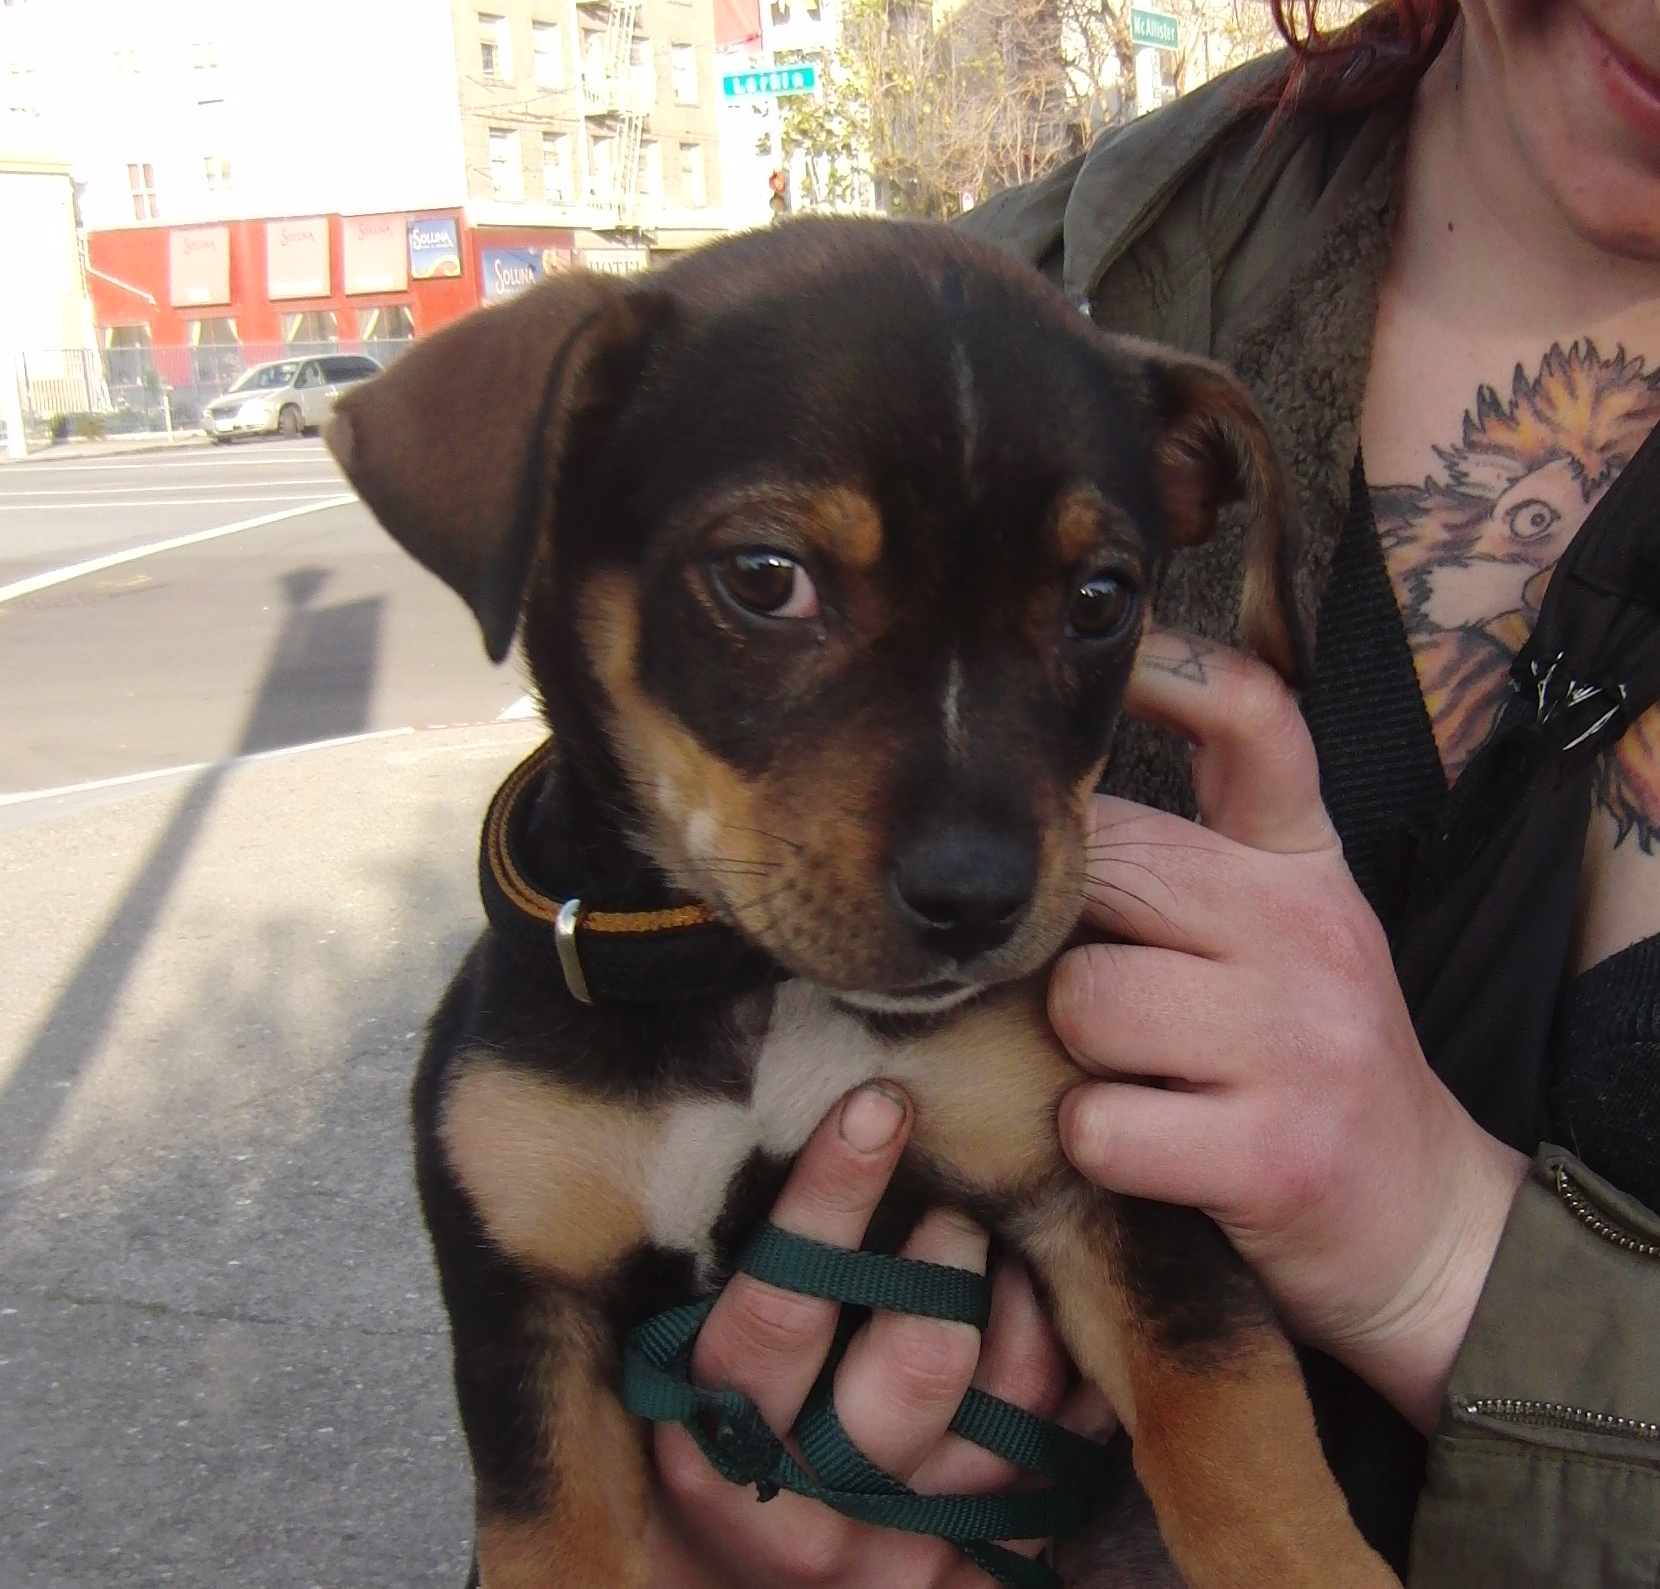 Pics photos dachshund chihuahua dog mix dogs pictures photos pics - Chihuahua Dachshund Pit Bull Terrier Mix